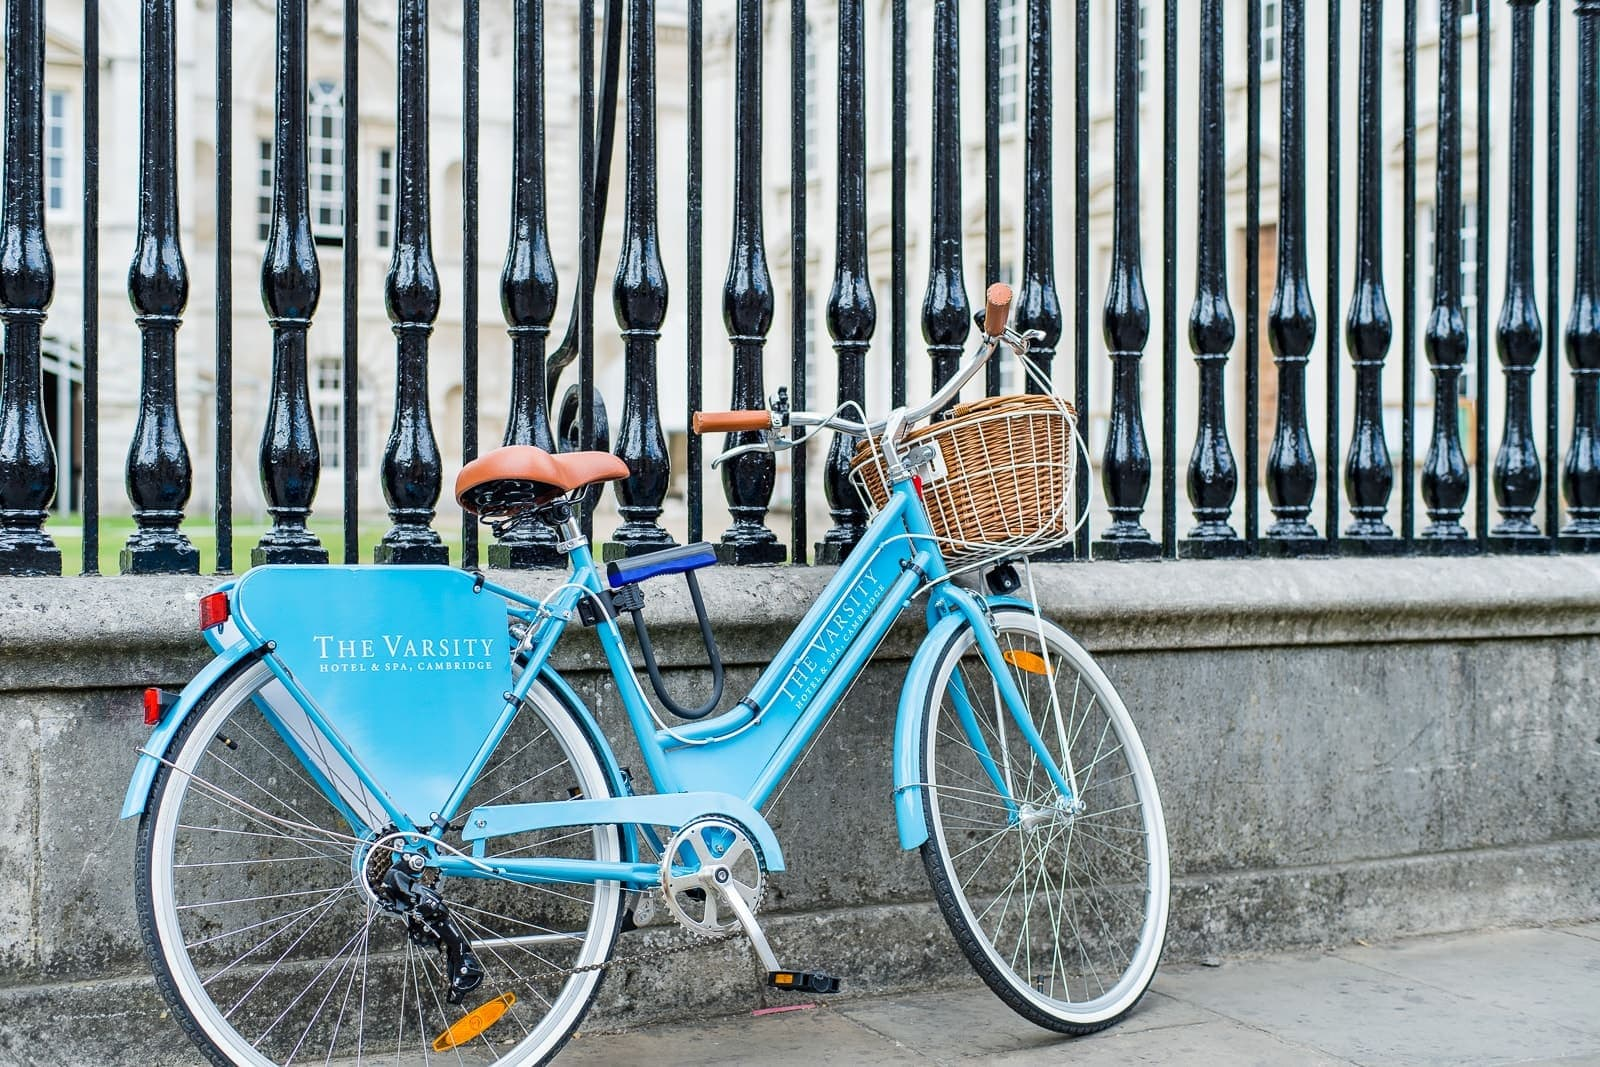 Bicycle at The Varsity Cambridge